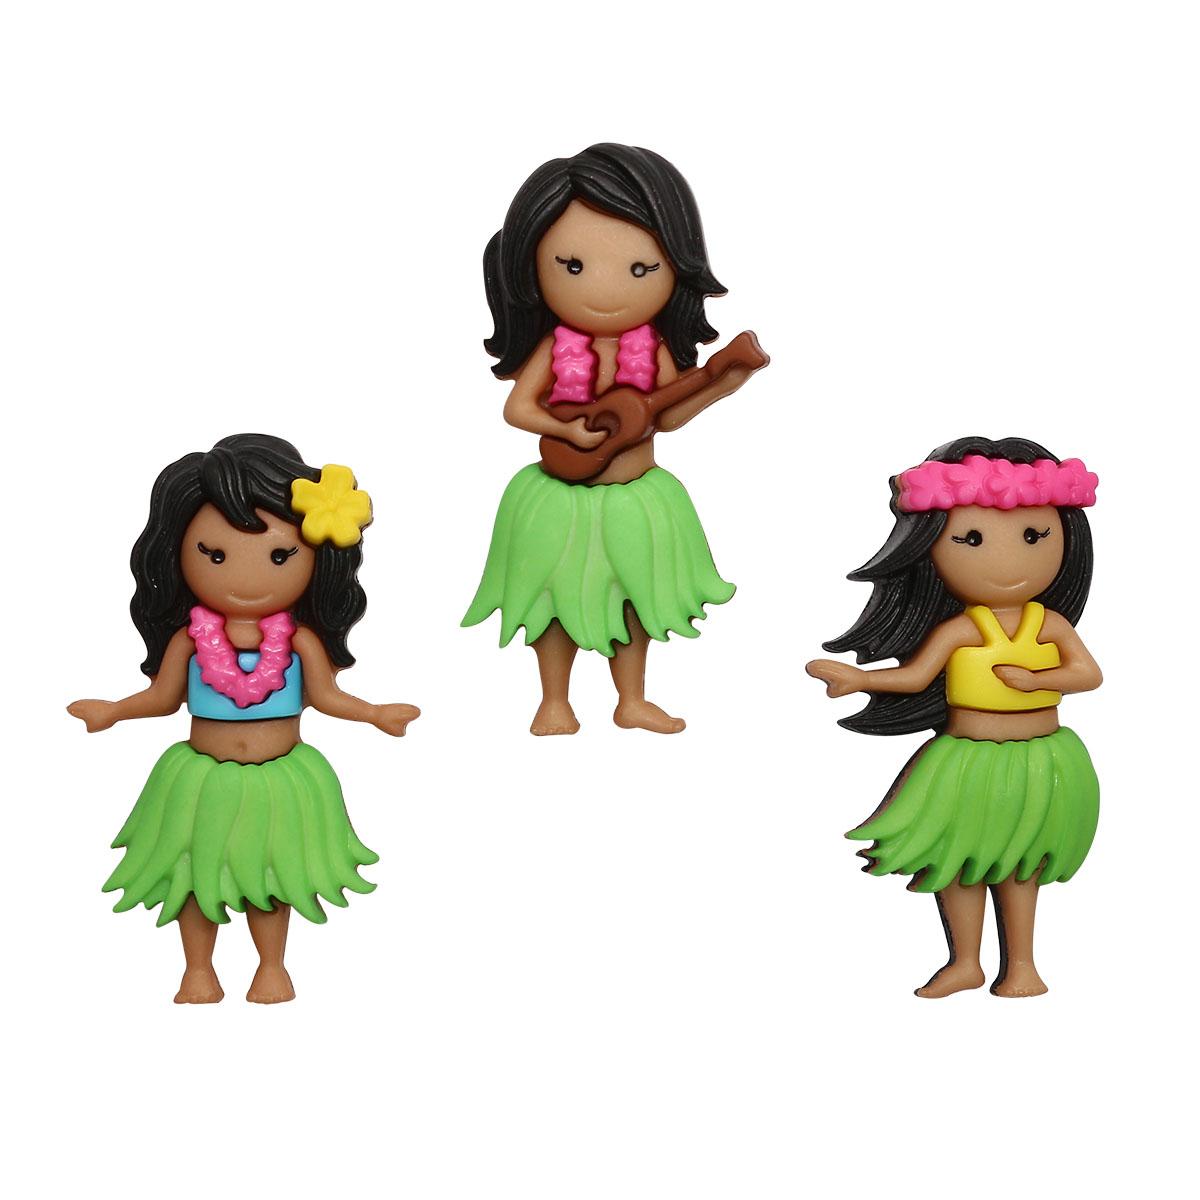 10408 Фигурки. Гавайские девочки Dress It Up